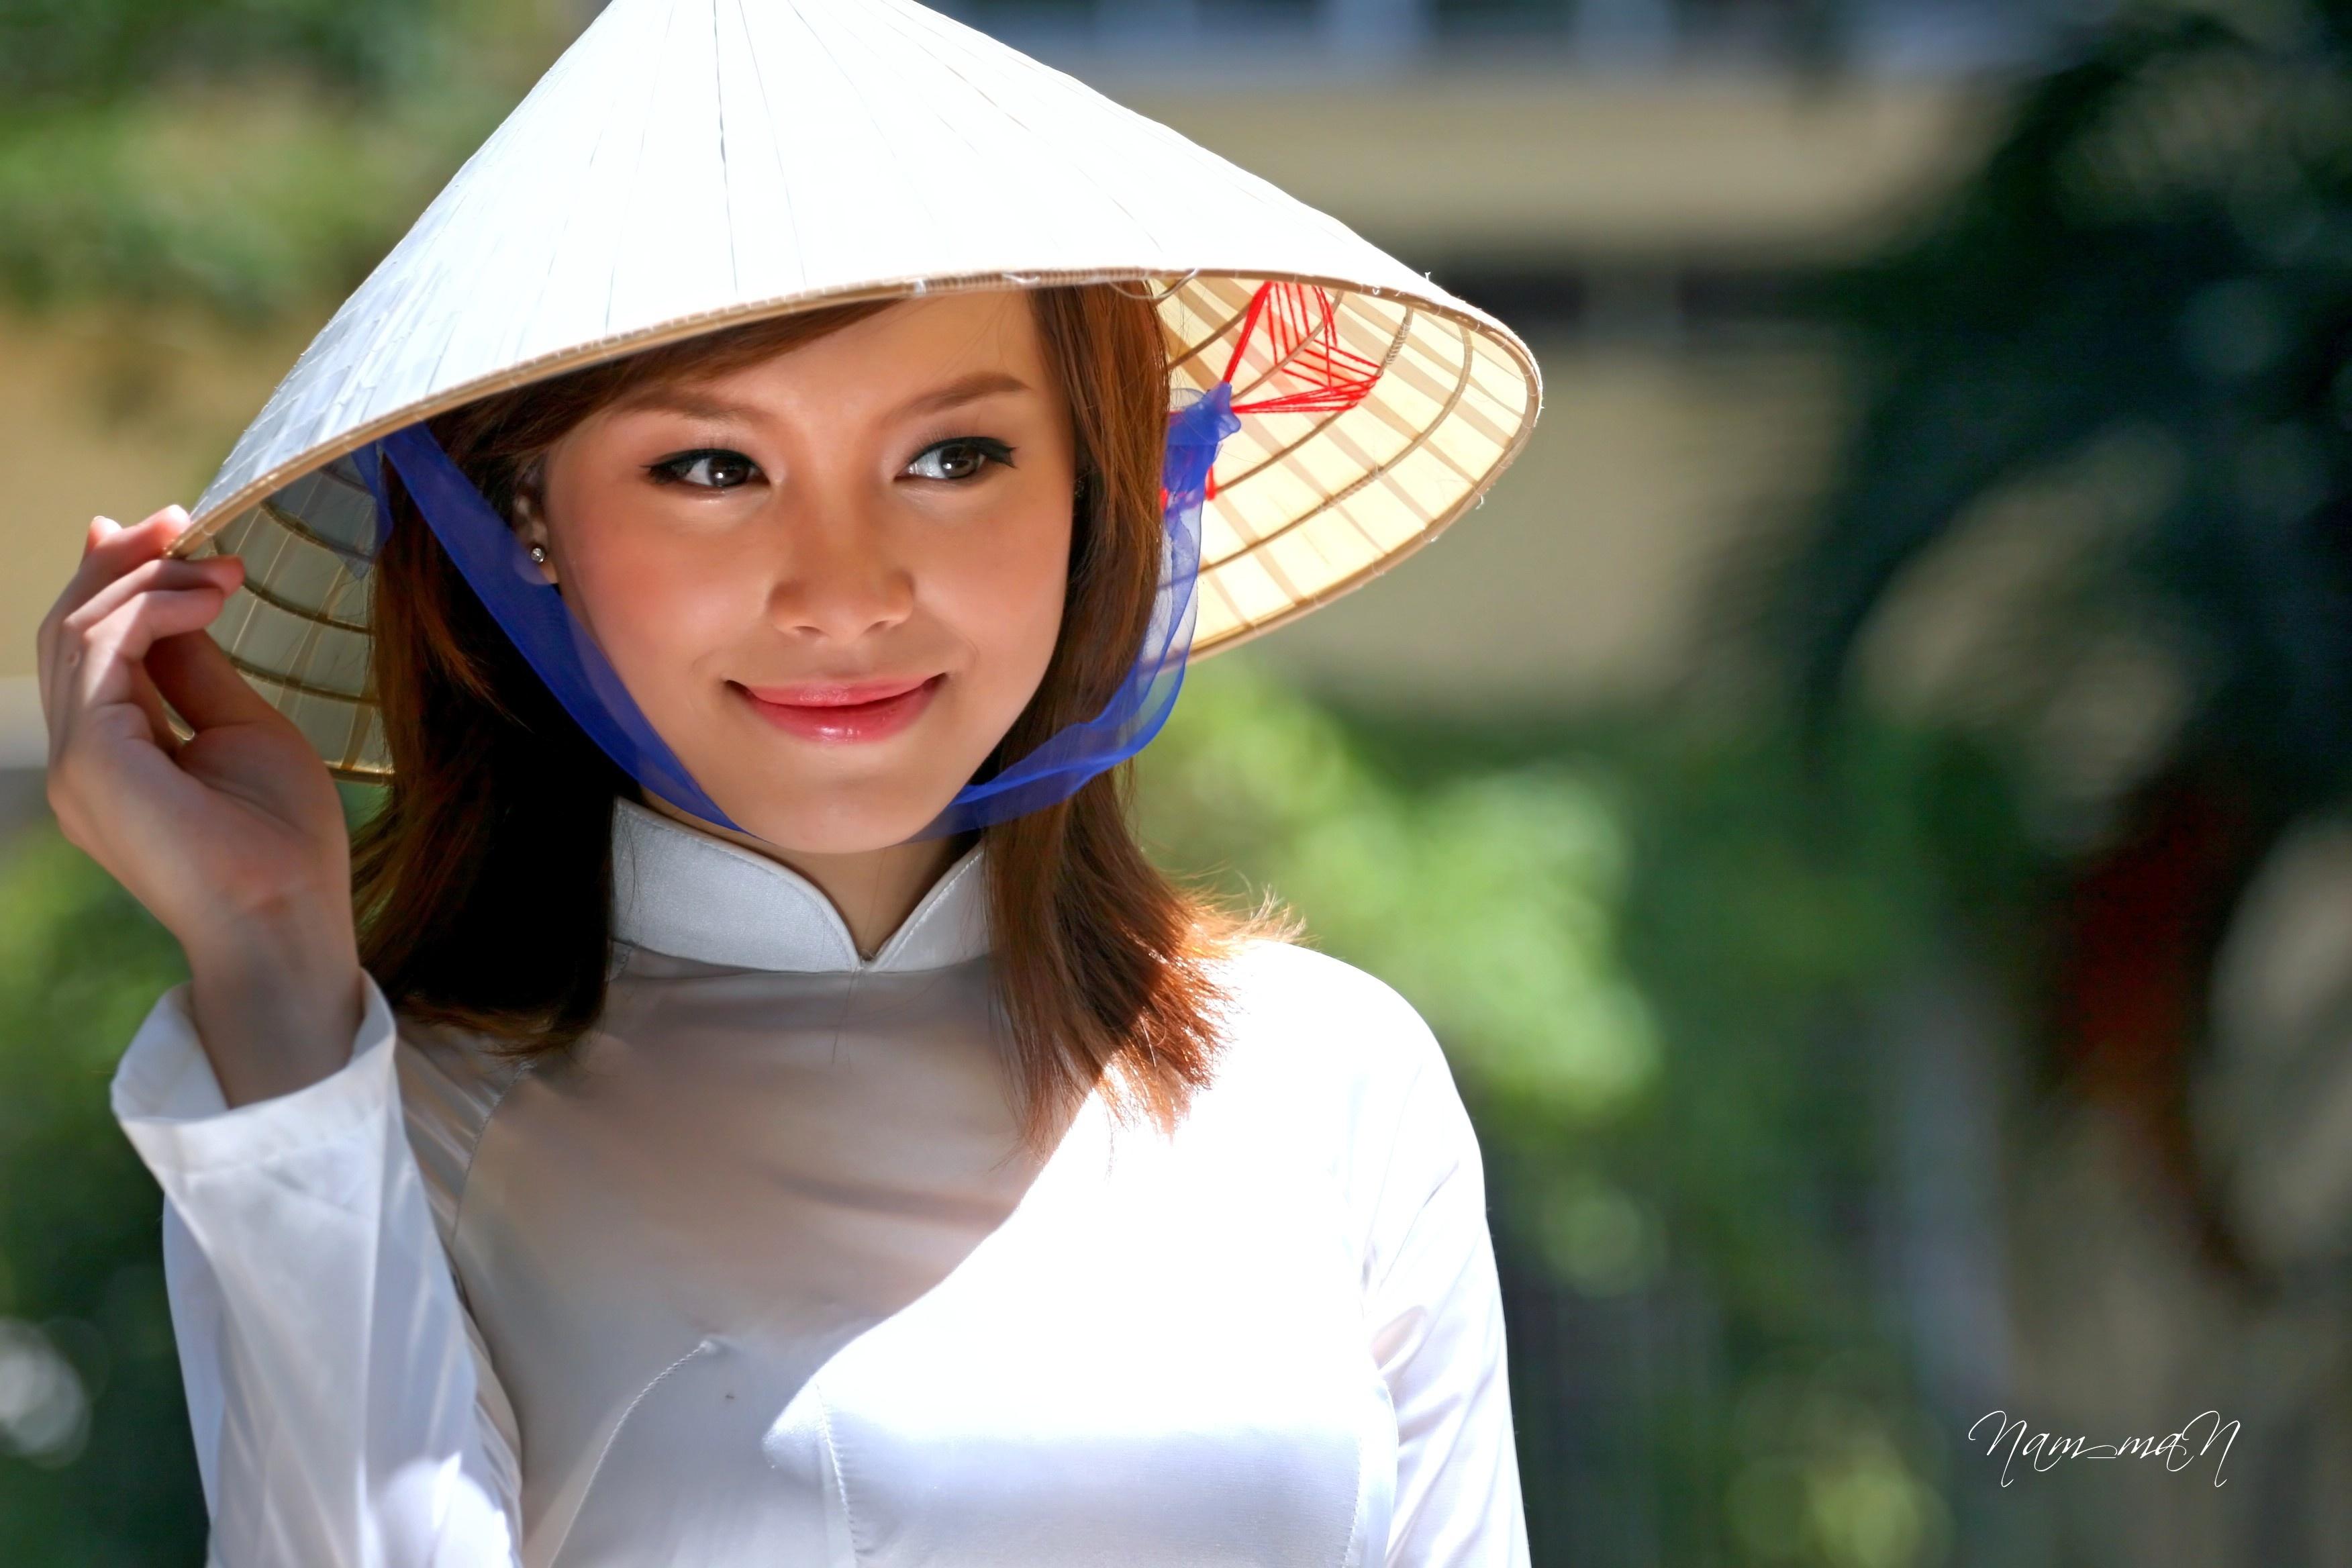 Фото девушки вьетнамки 2 фотография